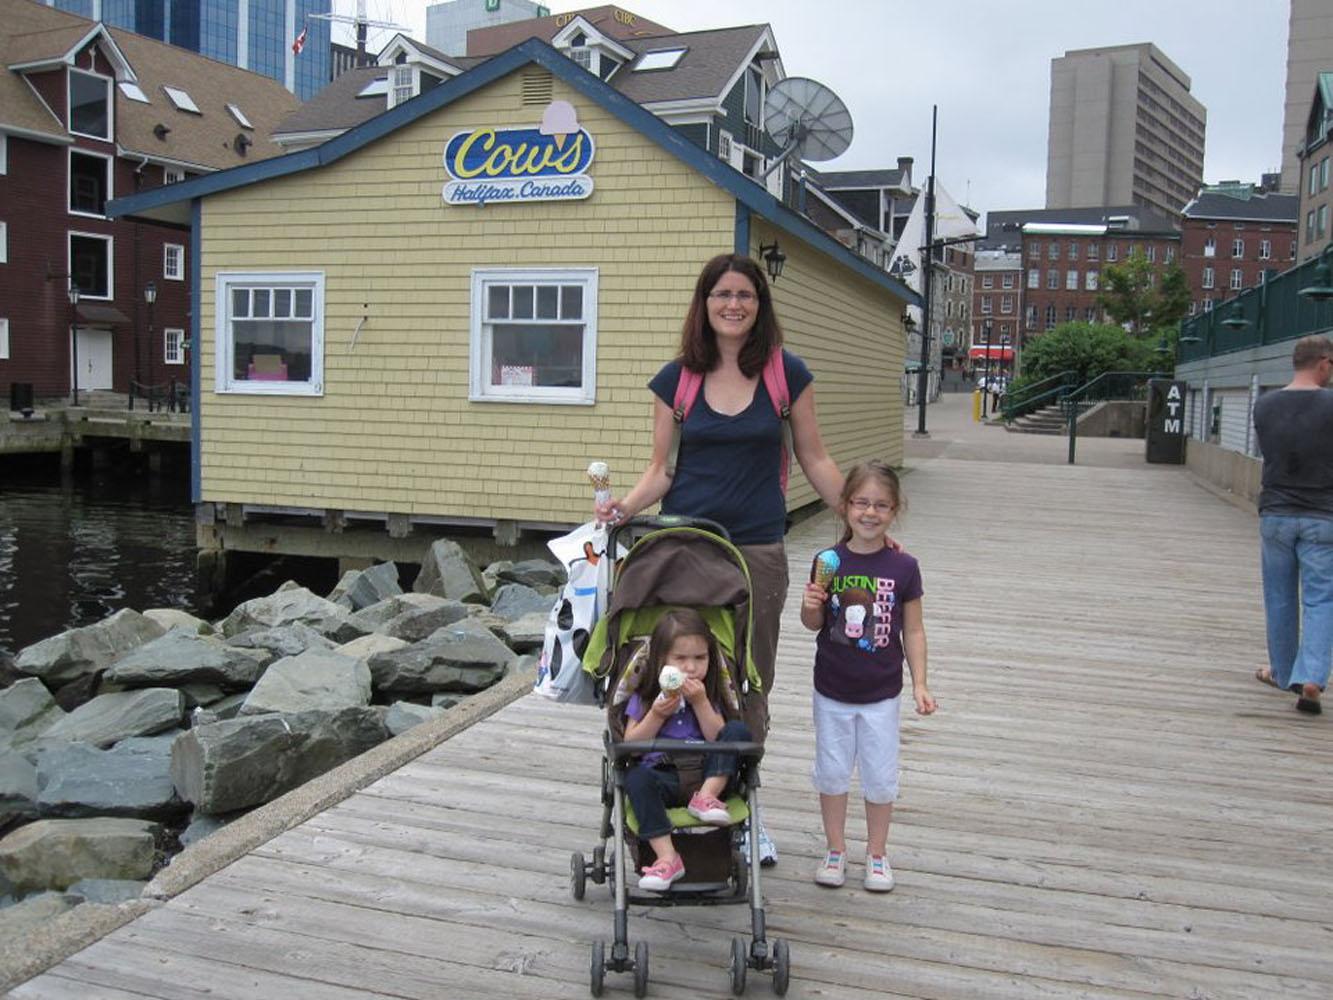 Explore the Disney Cruise Line port of call in Halifax, Nova Scotia | PassPorter.com